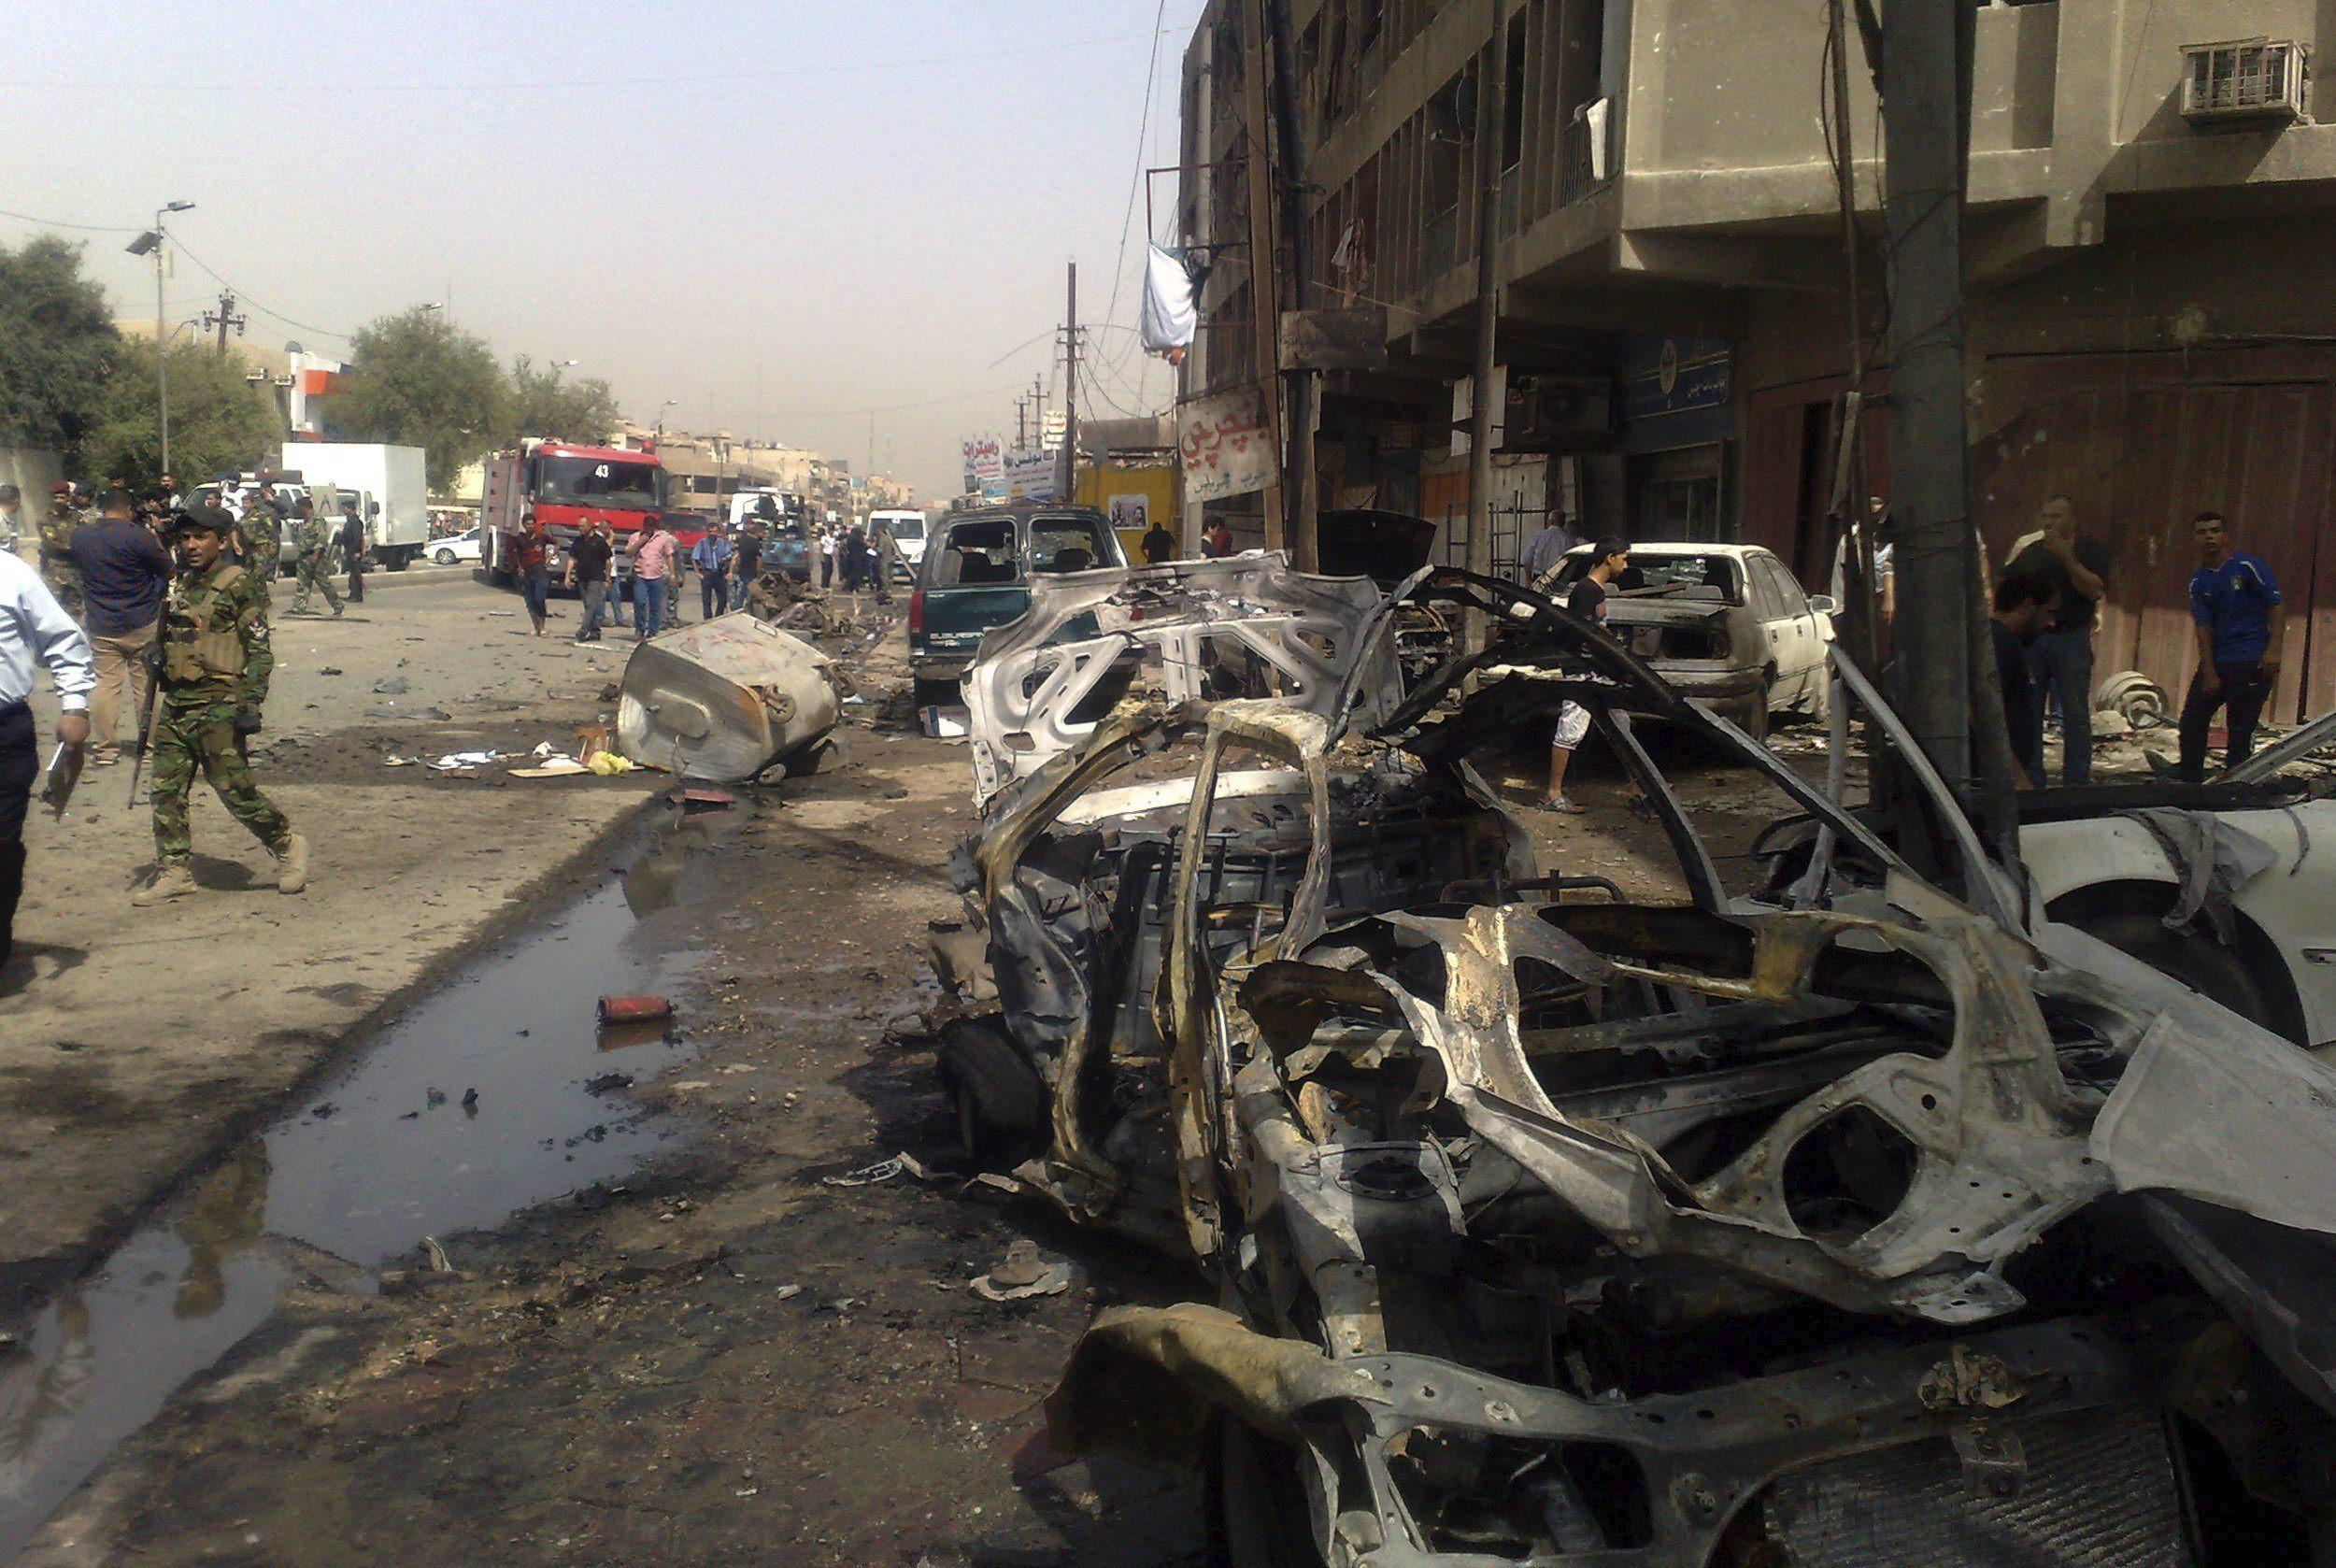 Hombres armados disfrazados de policías matan a ocho personas en Irak